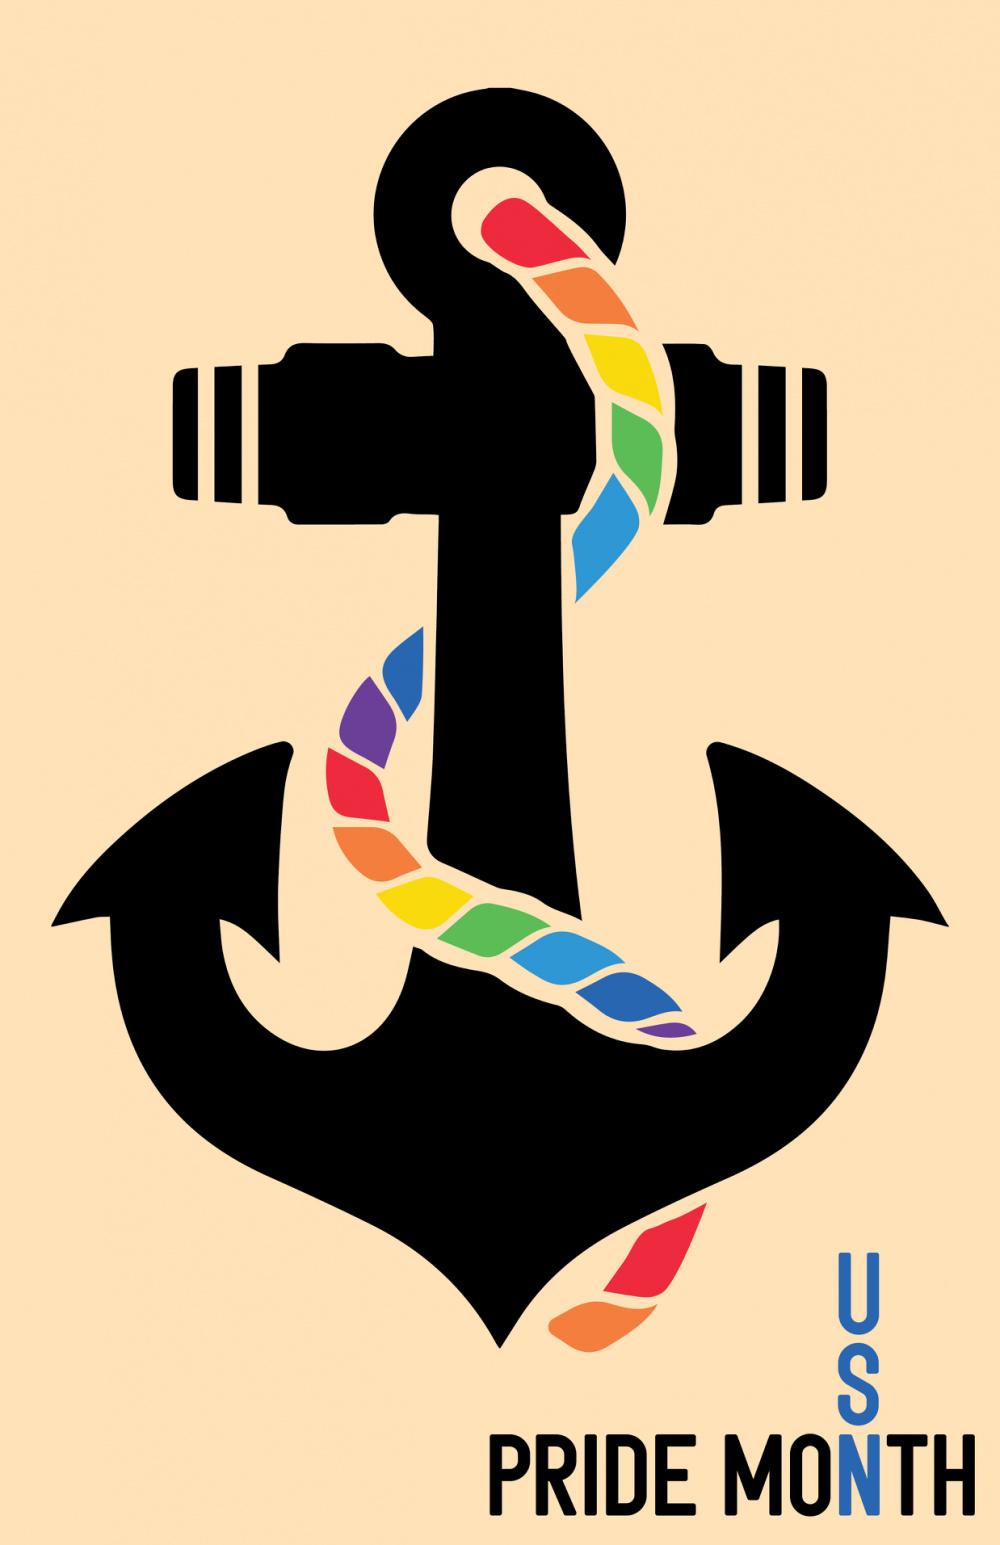 U.S. Navy Pride Month